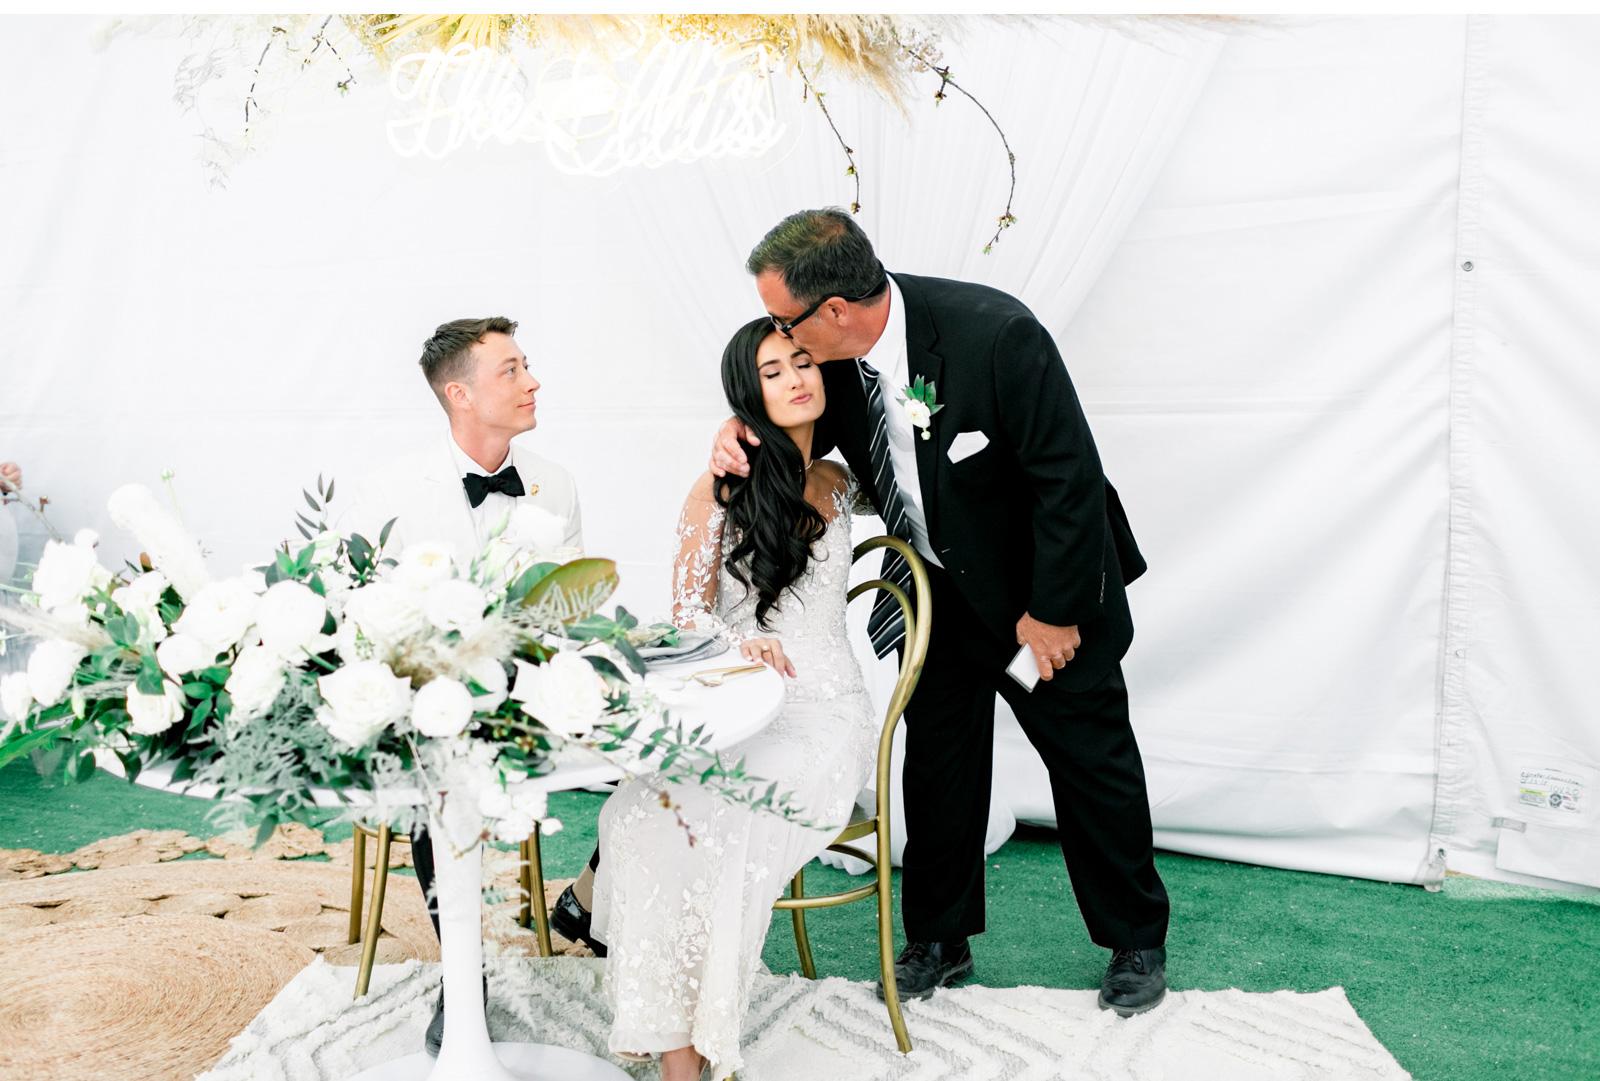 Southern-California-Wedding-Photographer-West-Coast-Weddings-Style-Me-Pretty-Malibu-Wedding-Photographer-Natalie-Schutt-Photography_10.jpg